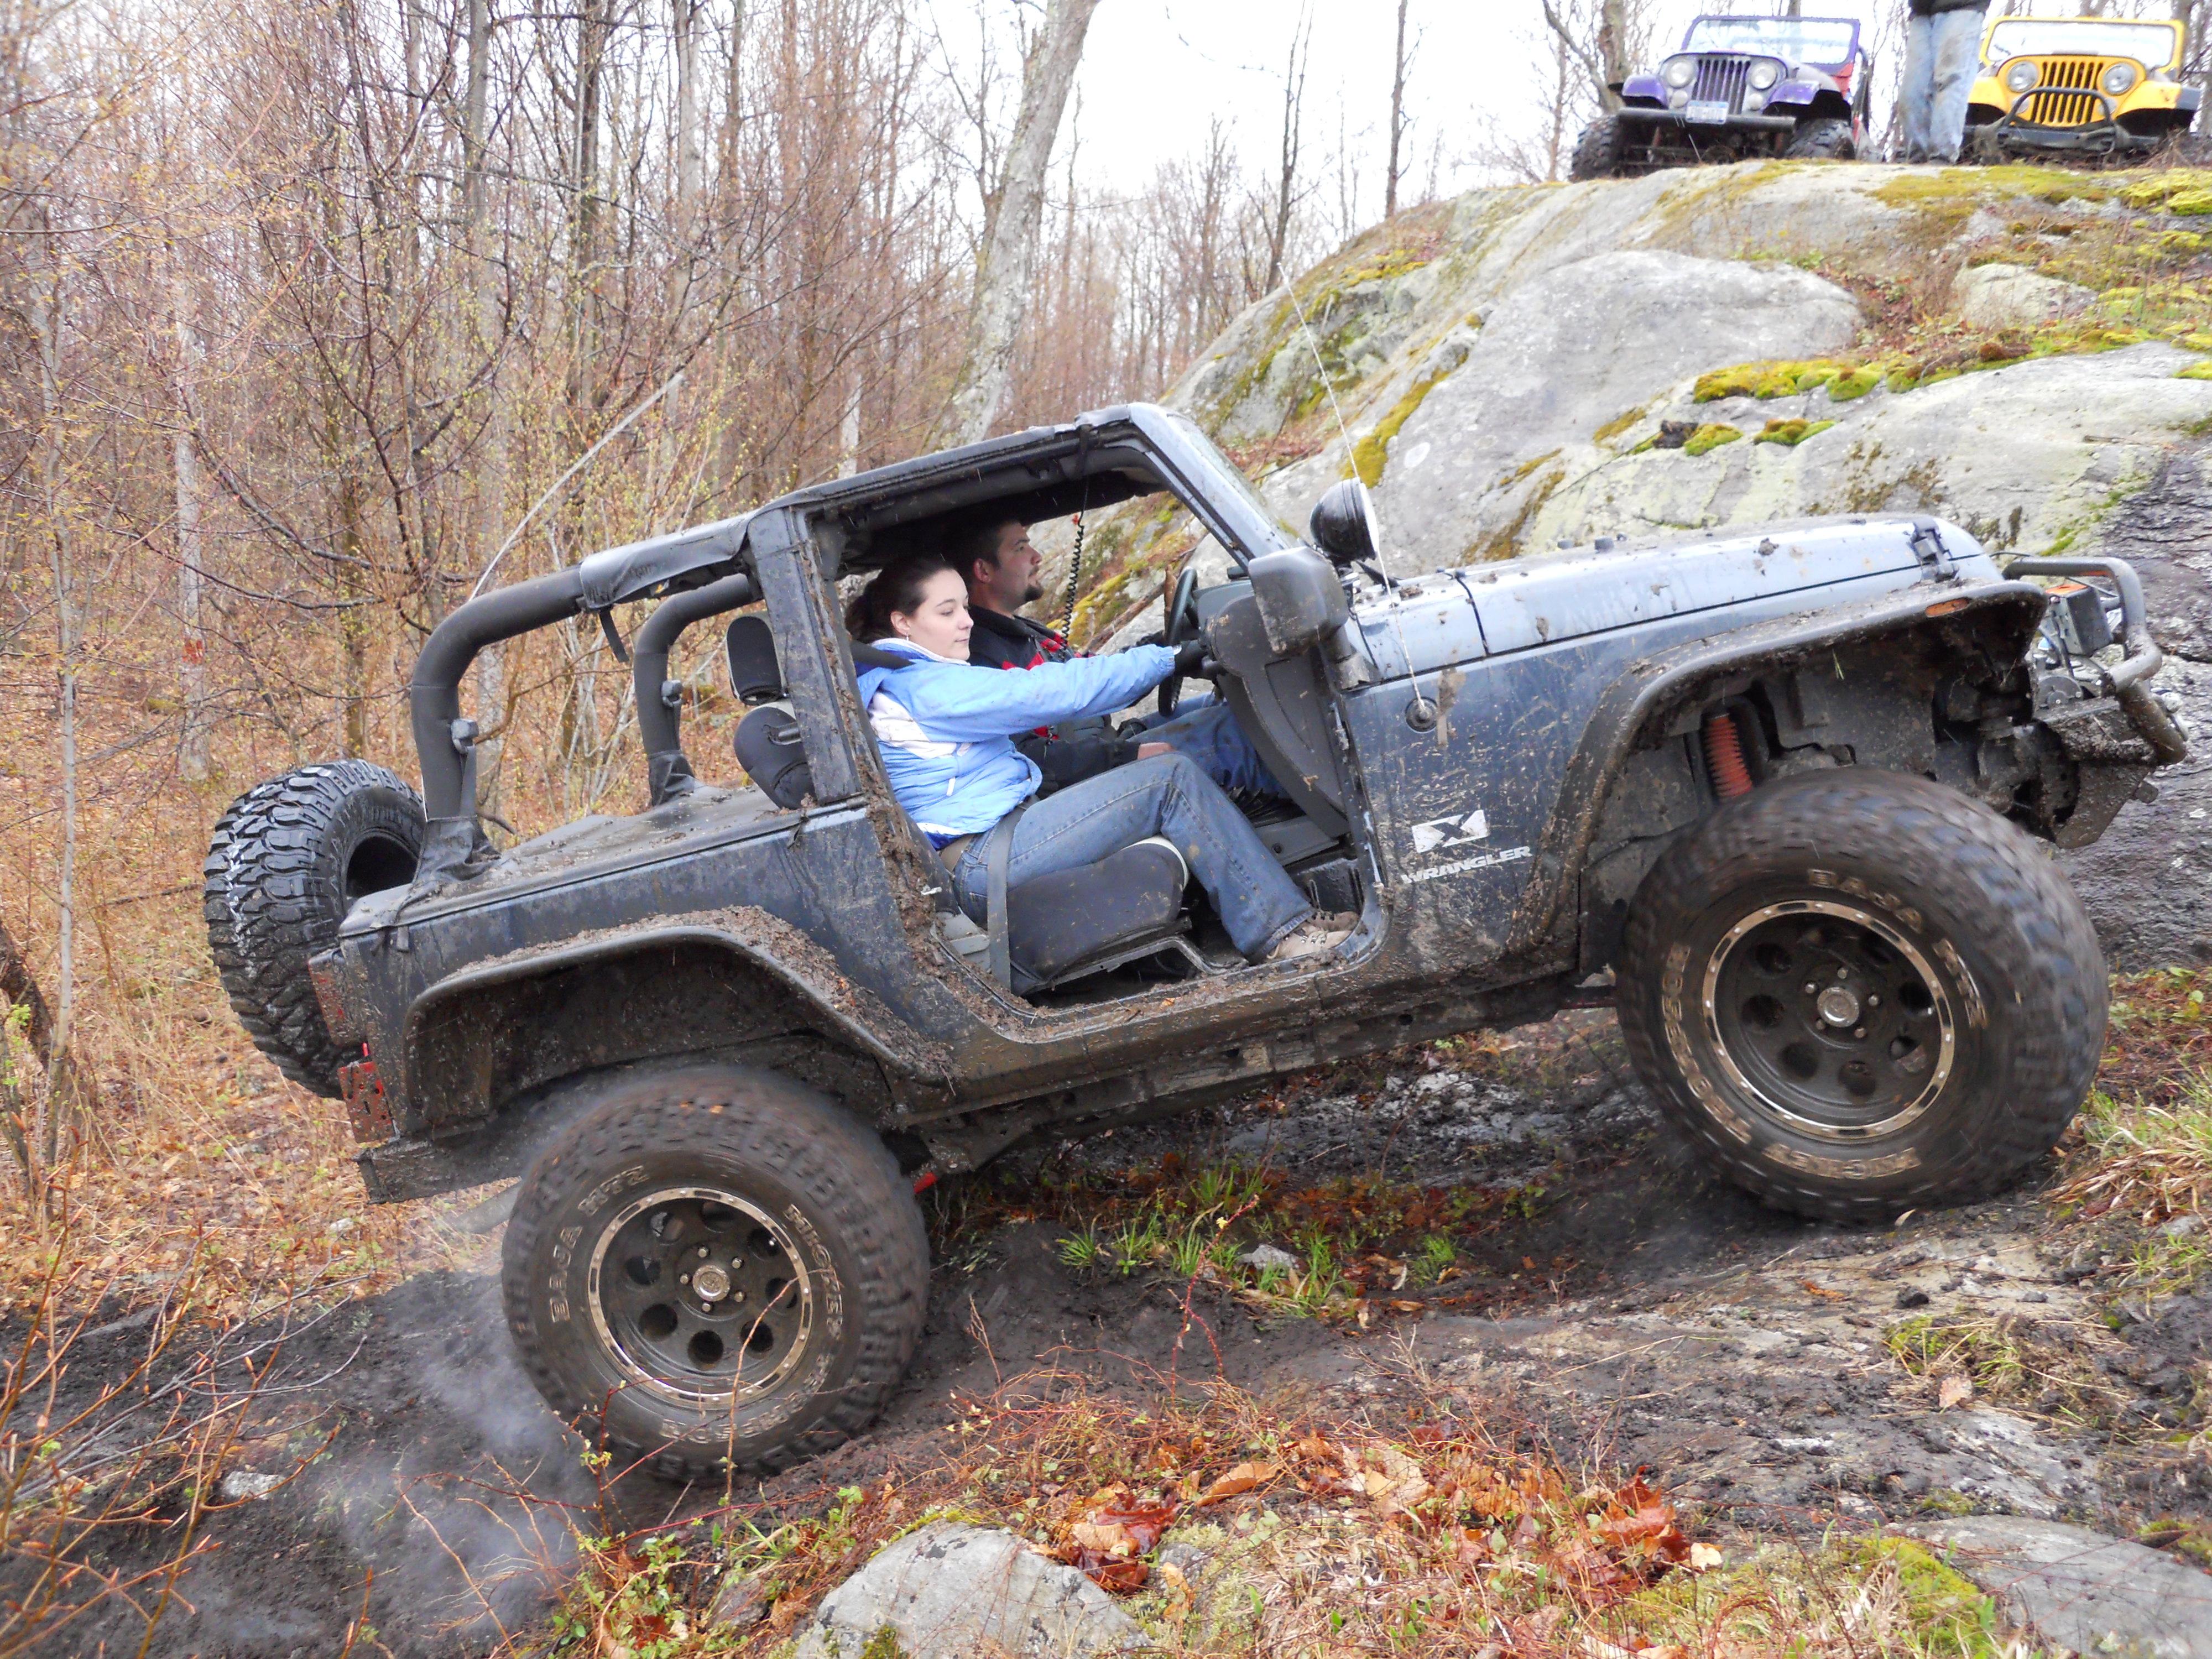 Jeep JK tire smoke climbing rock